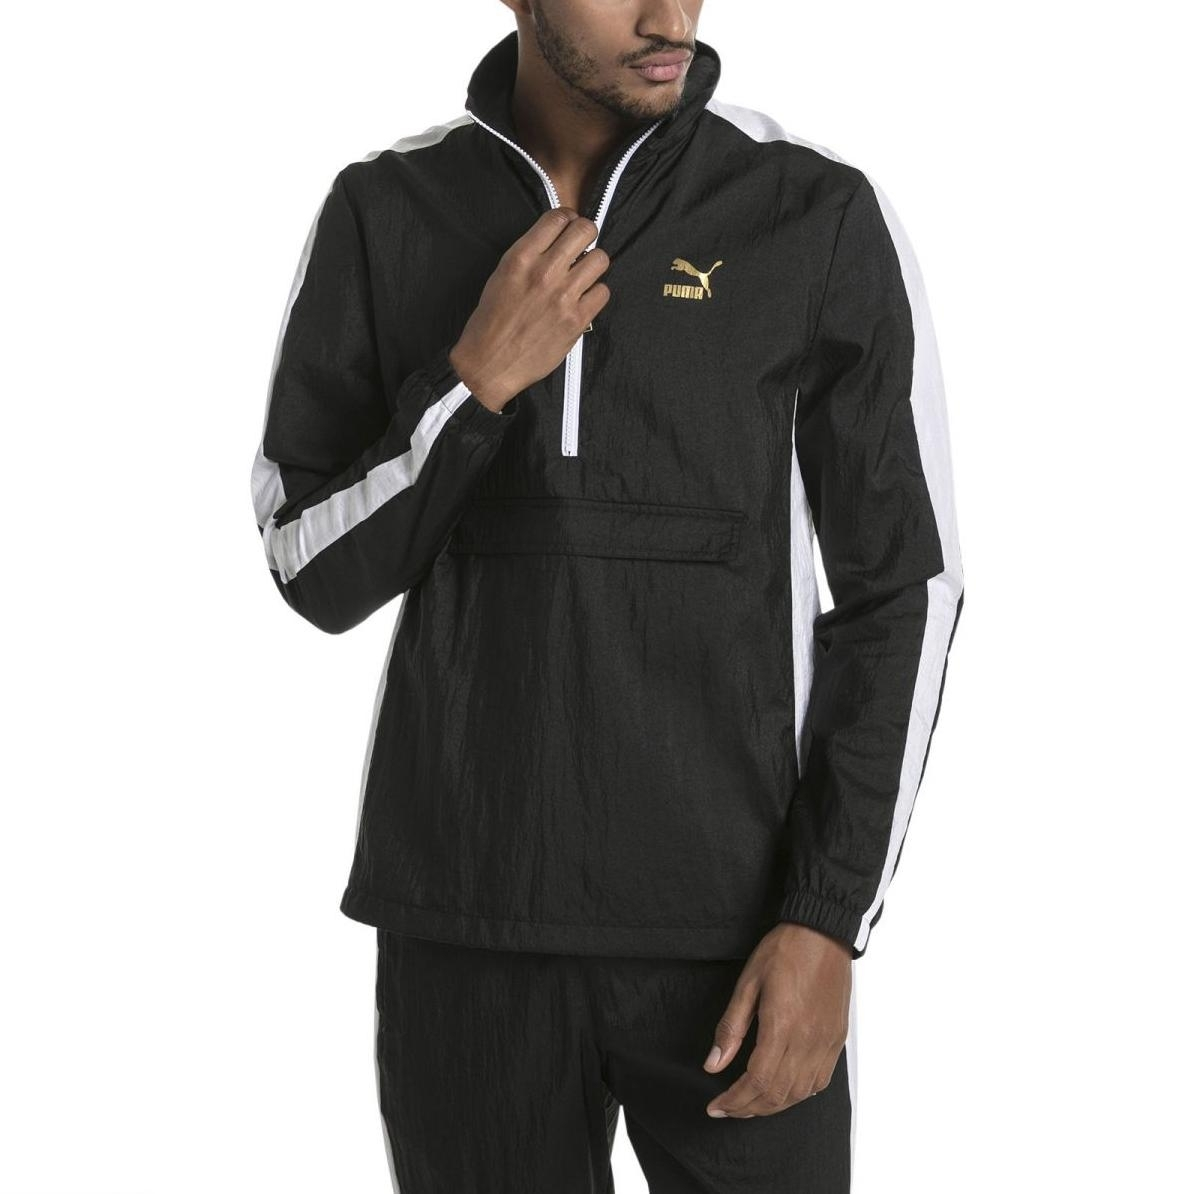 Puma T7 BBoy Track Jacket Herren Trainingsjacke schwarz weiß